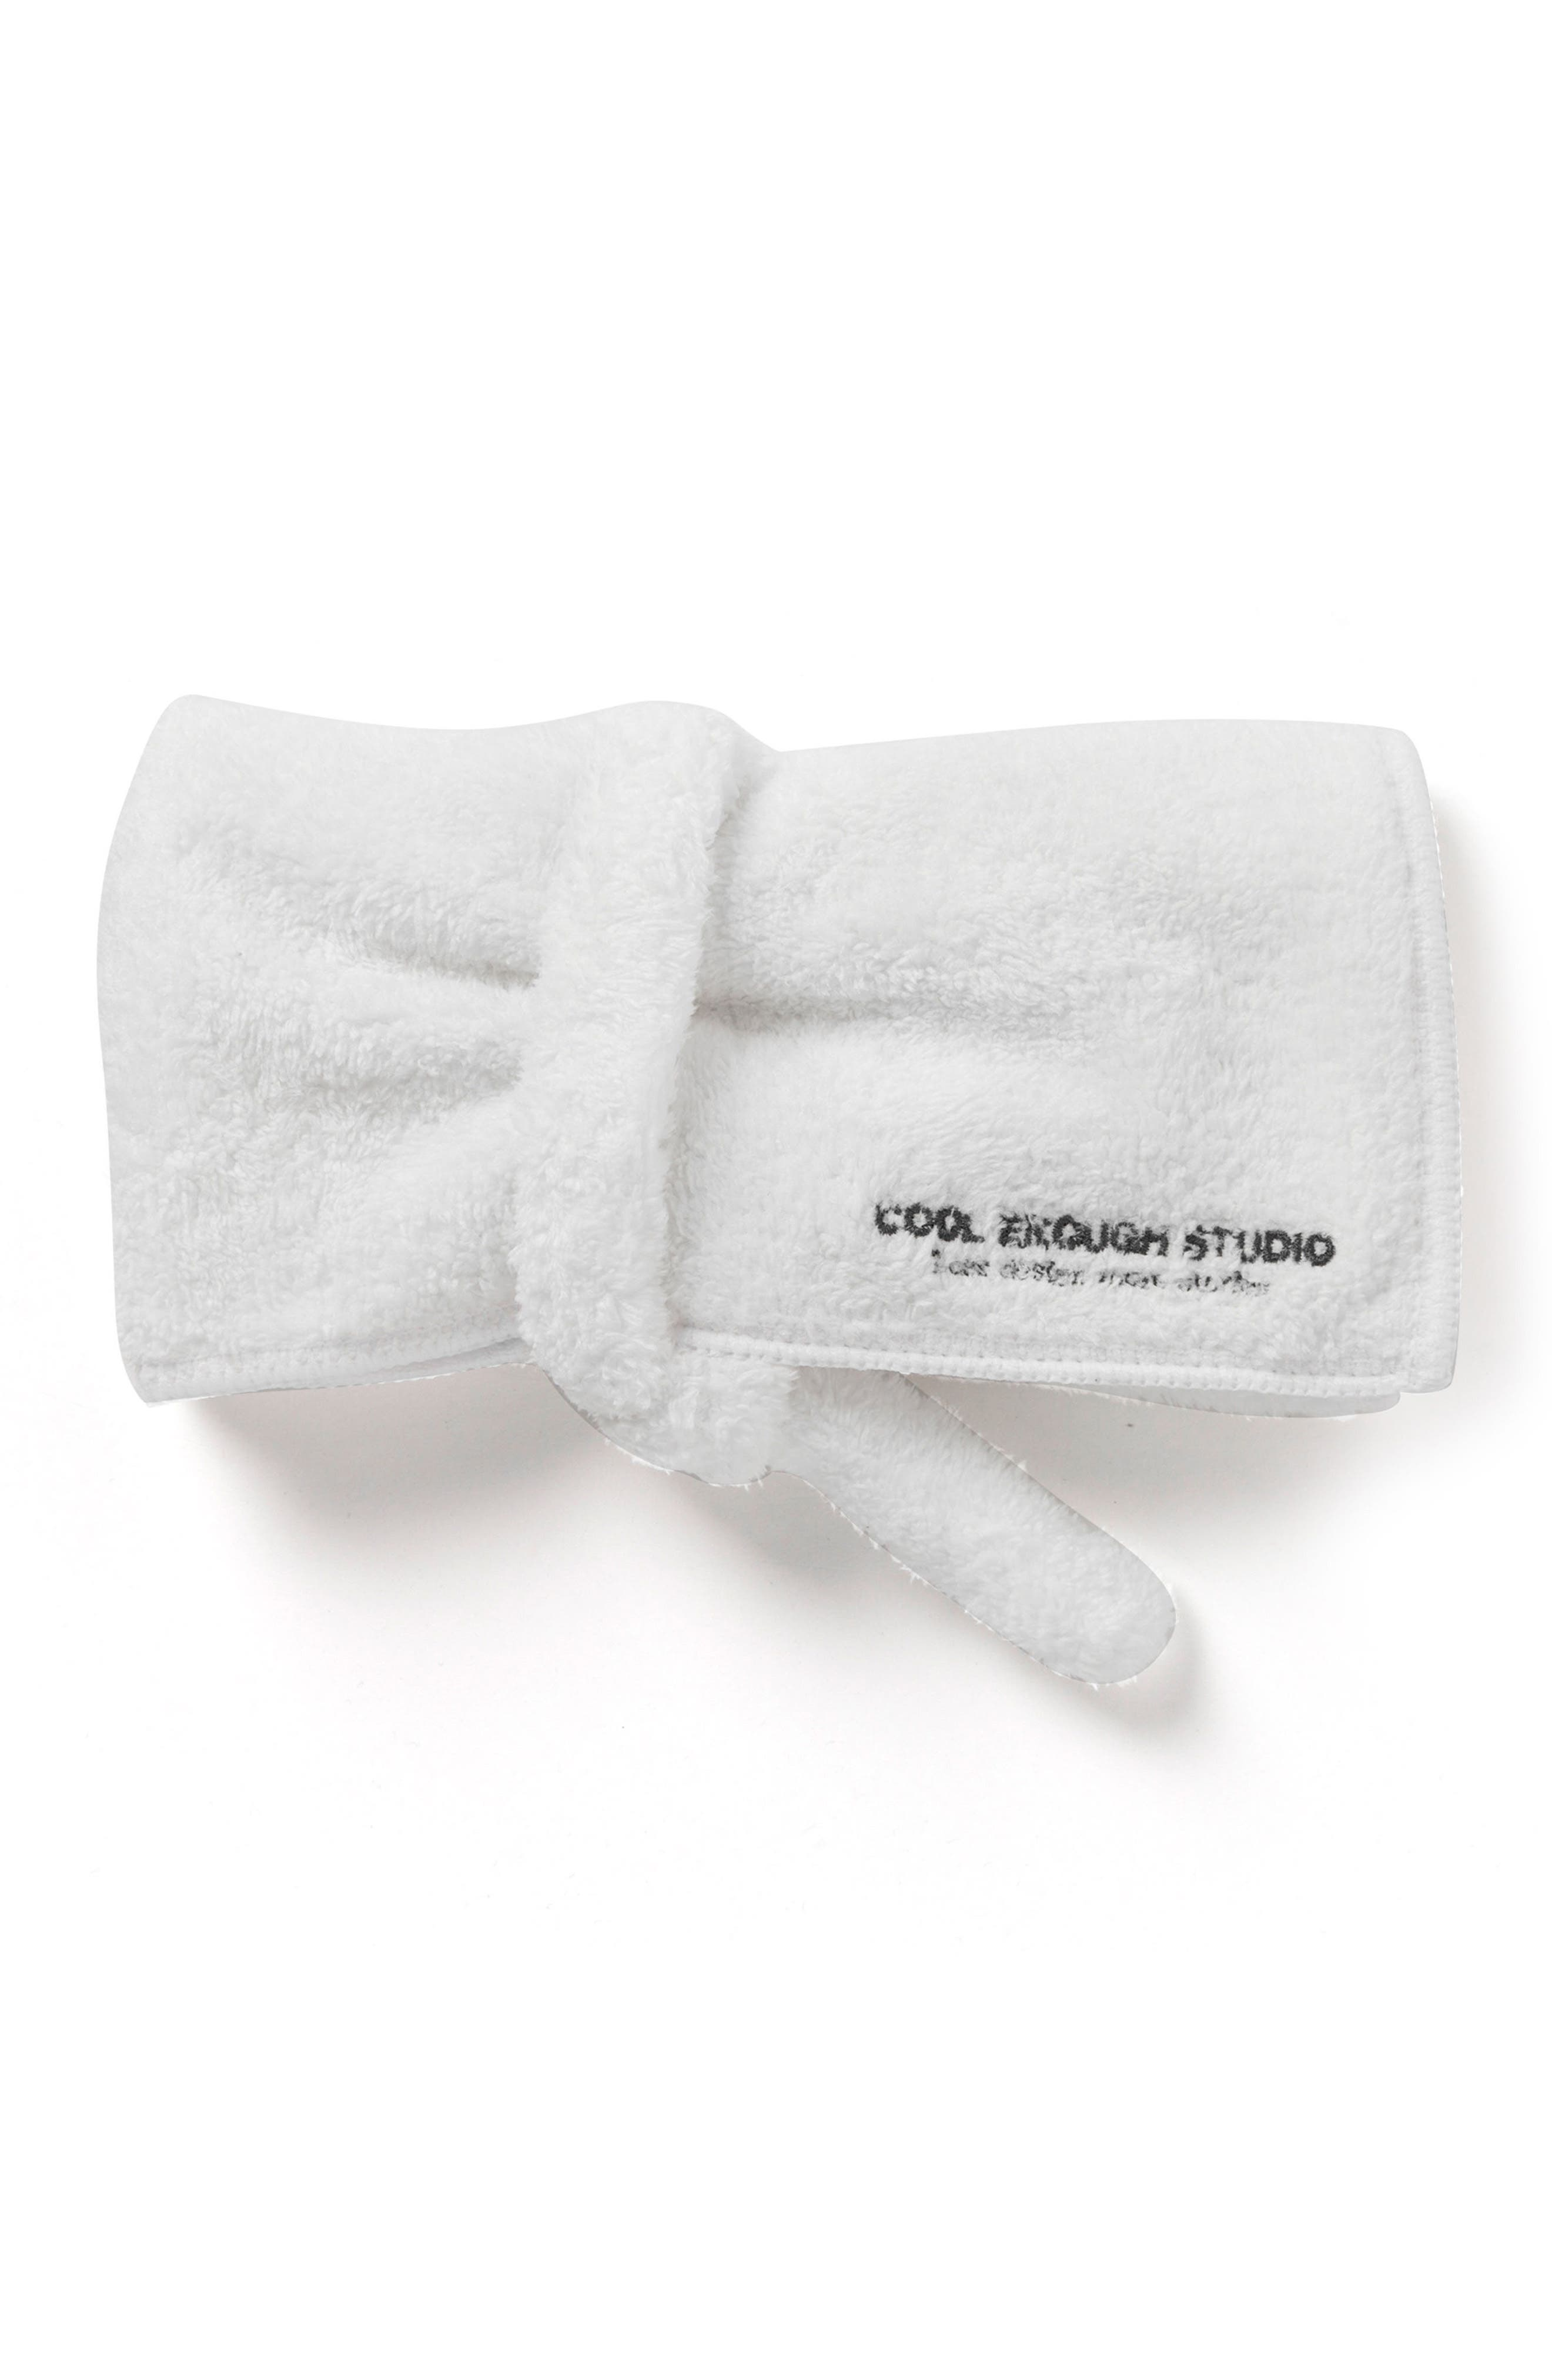 The Towel Microfiber Toiletry Organizer,                             Main thumbnail 1, color,                             100